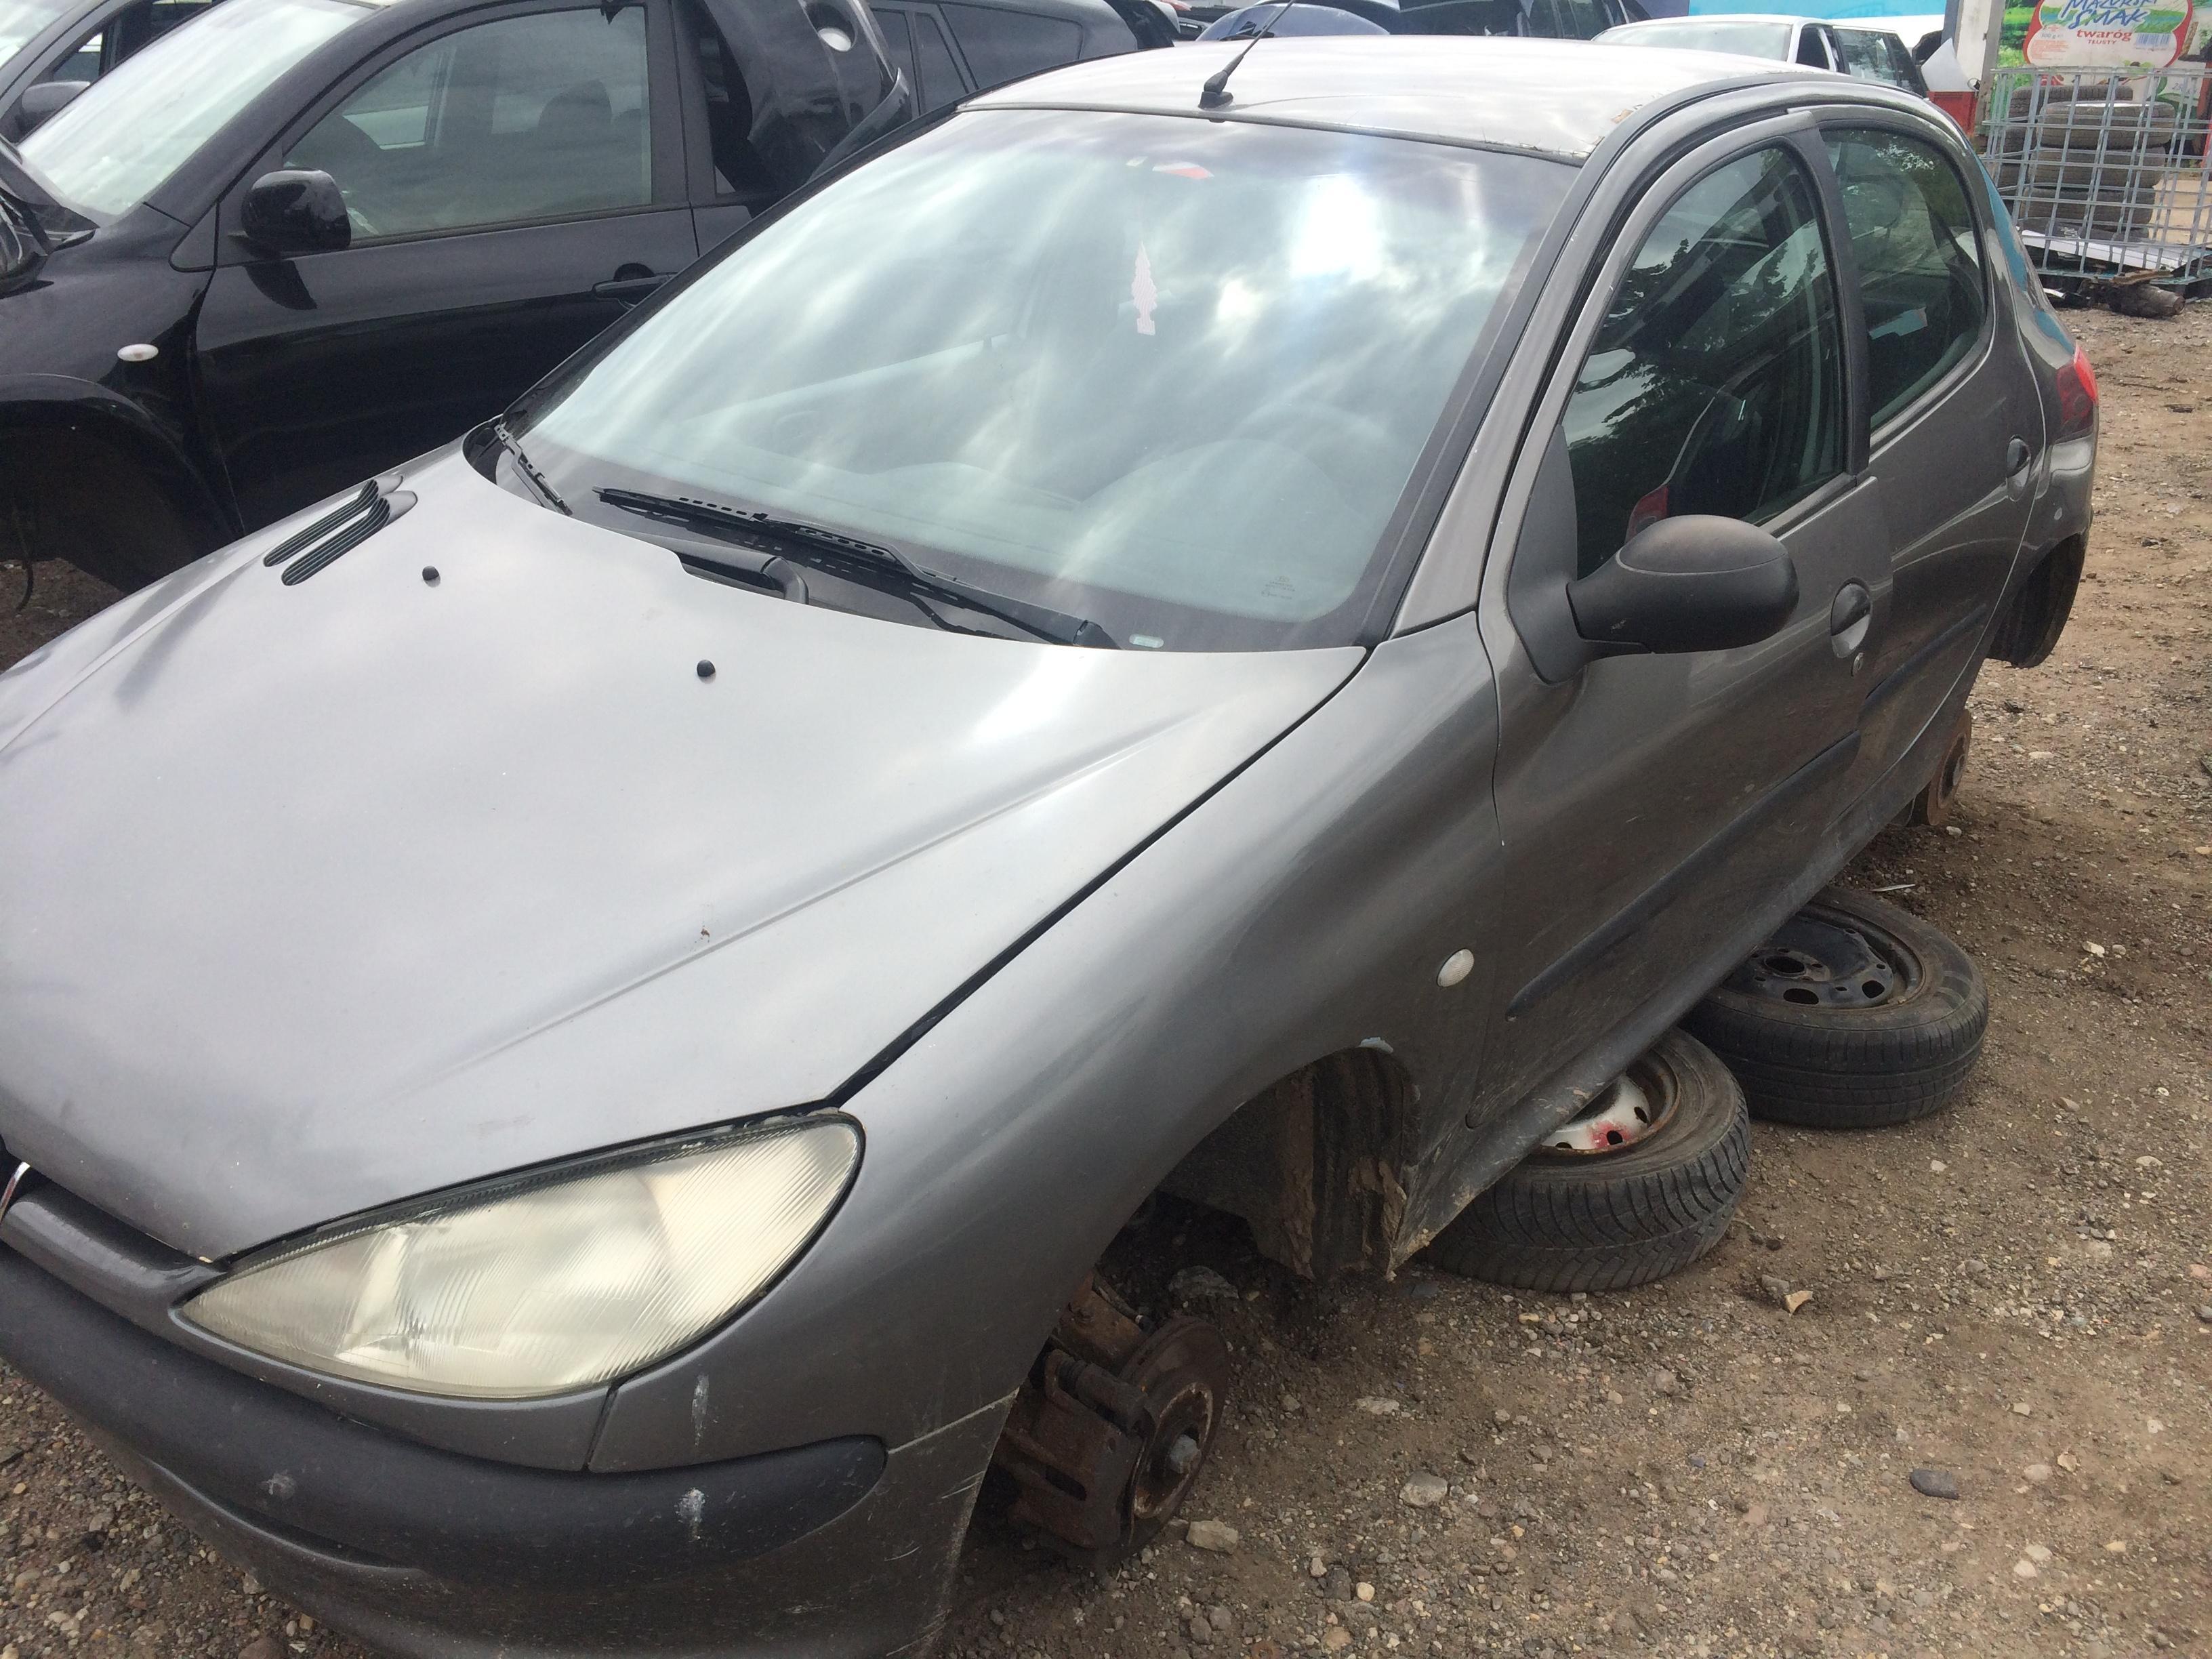 9610927380 Used Fuse Box Peugeot 206 1999 19l 10eur Eis00468796 Central Locking Foto 2 199808 200207 Diesel 19